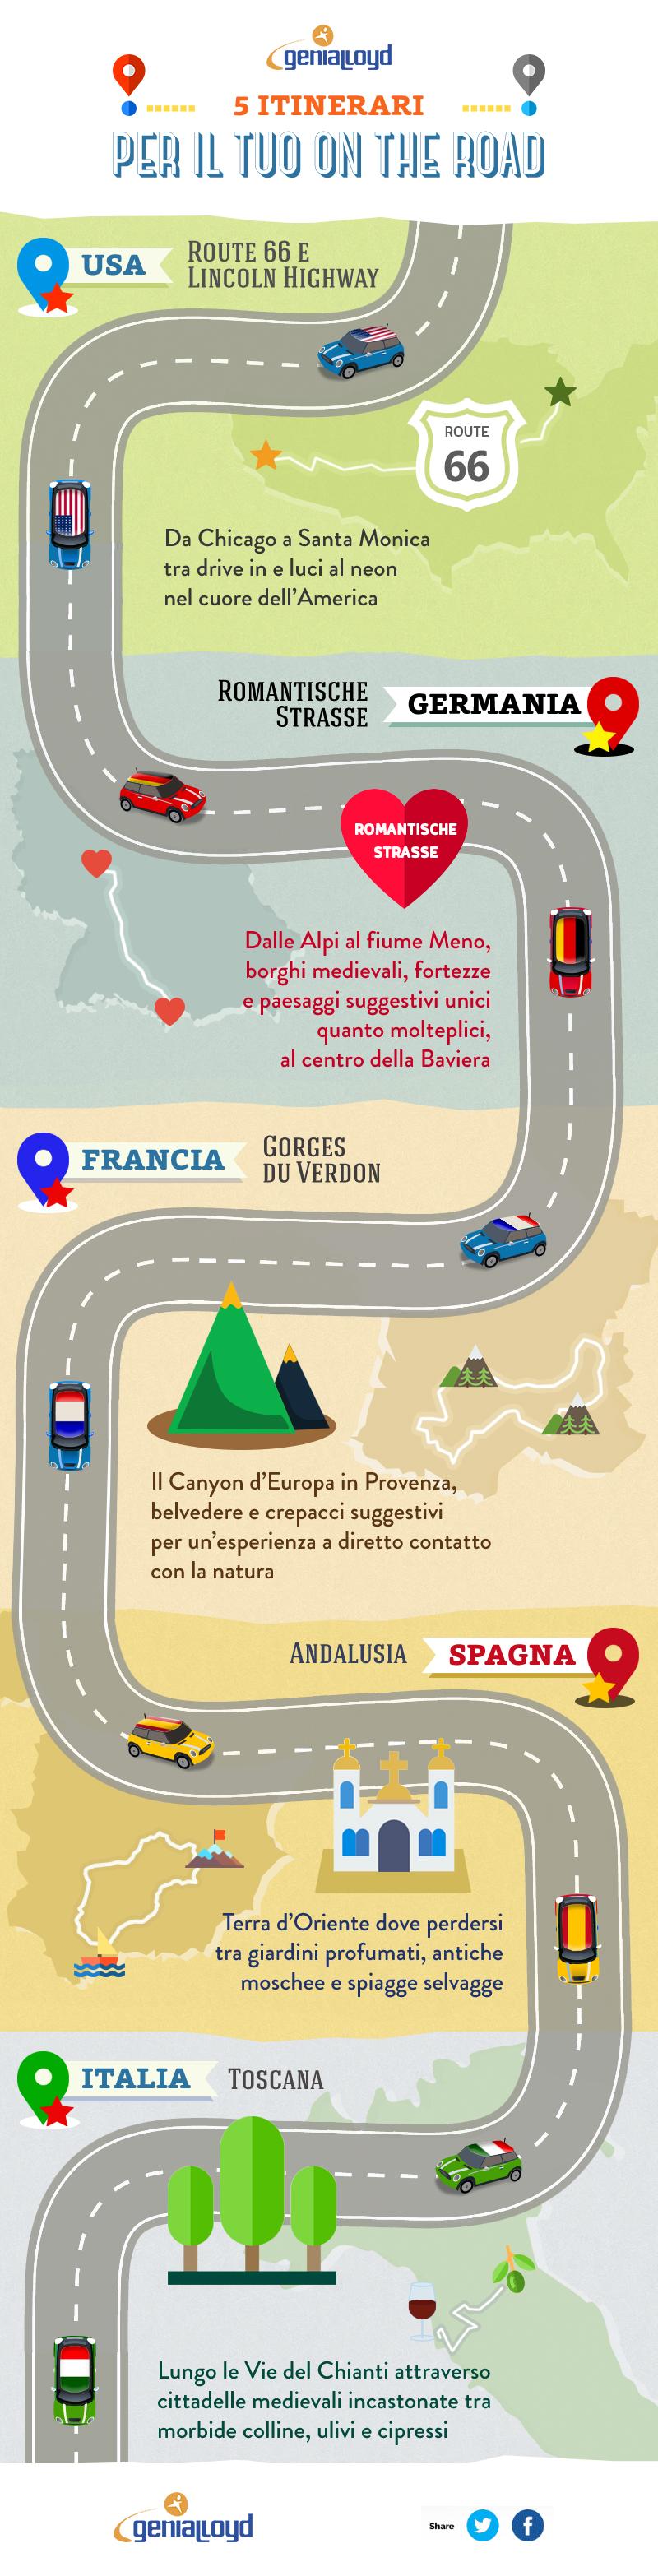 Infografica viaggi on the road